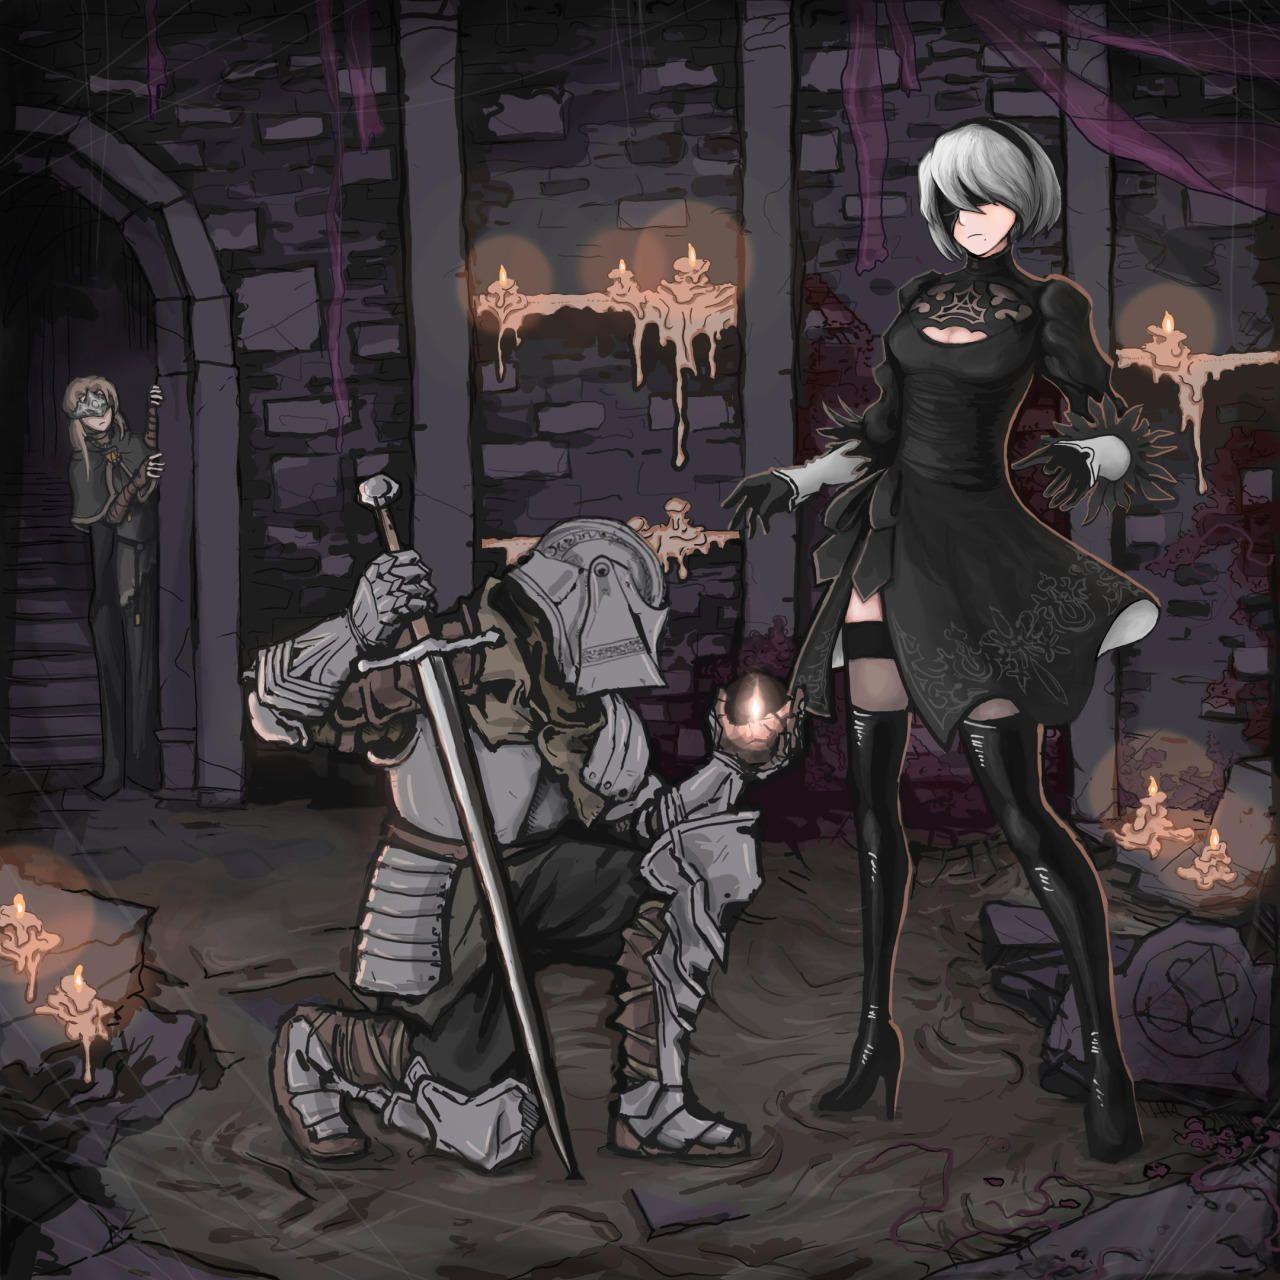 Dark Souls Fire Keeper Anime HD Print Wall Poster Scroll Room Decor